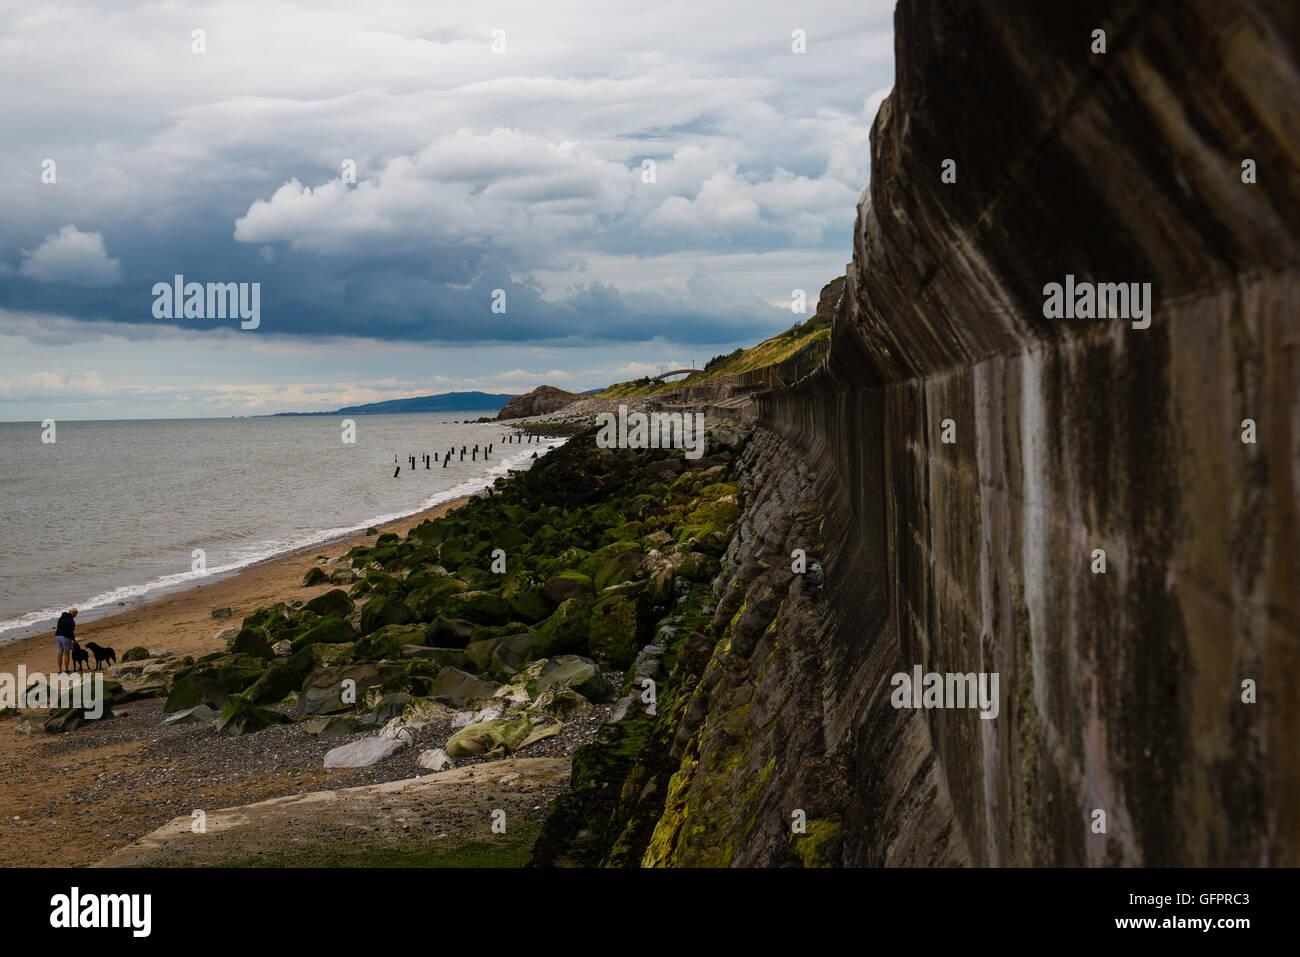 Rainbow Bridge, Colwyn Bay, Wales. - Stock Image